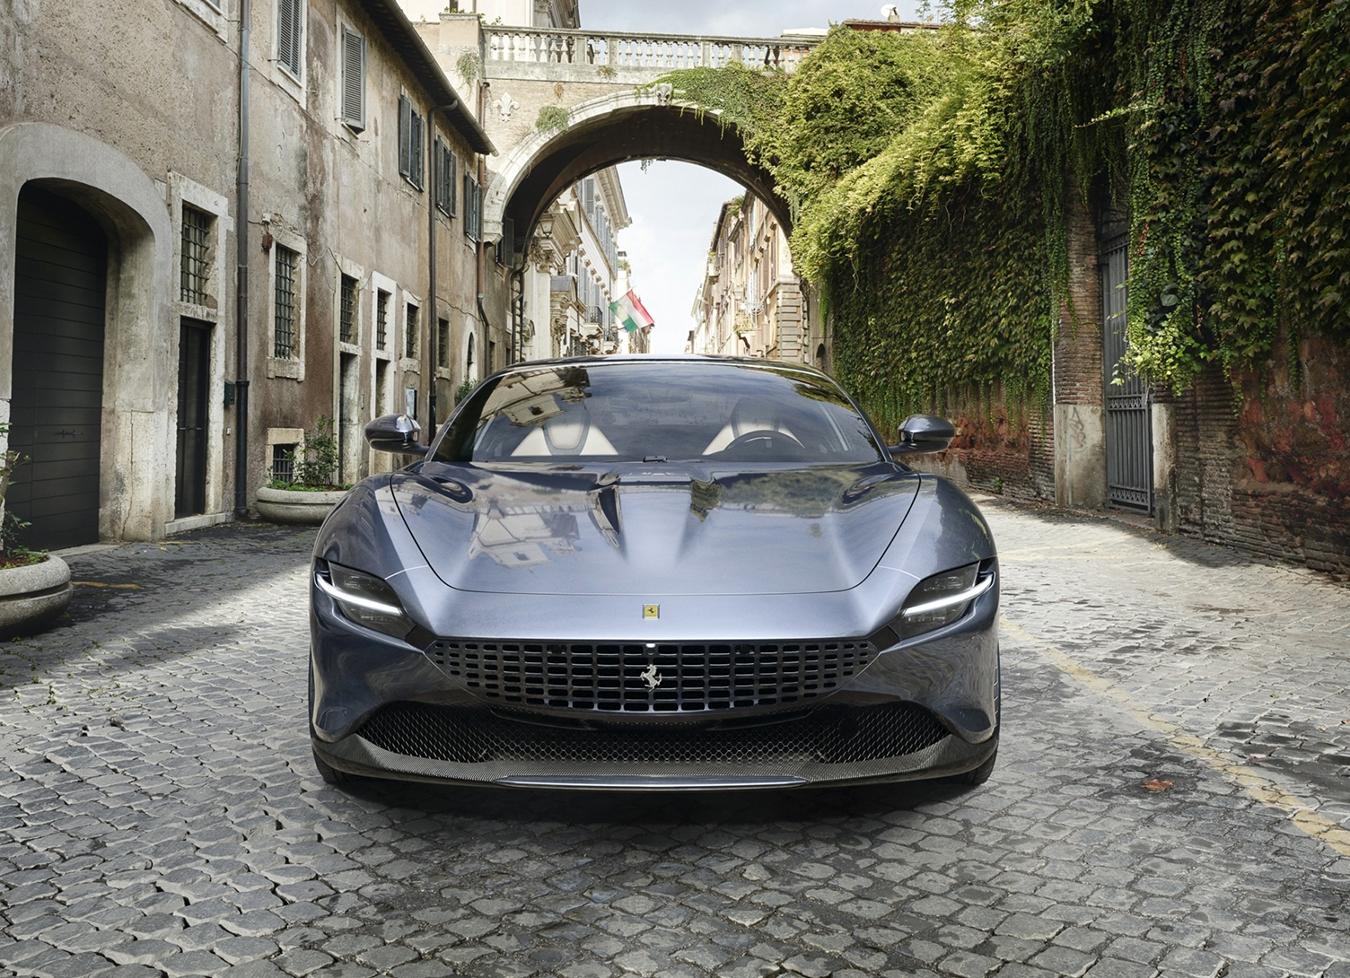 , The 2020 Ferrari Roma: Why we need beautiful cars, Saubio Making Wealth